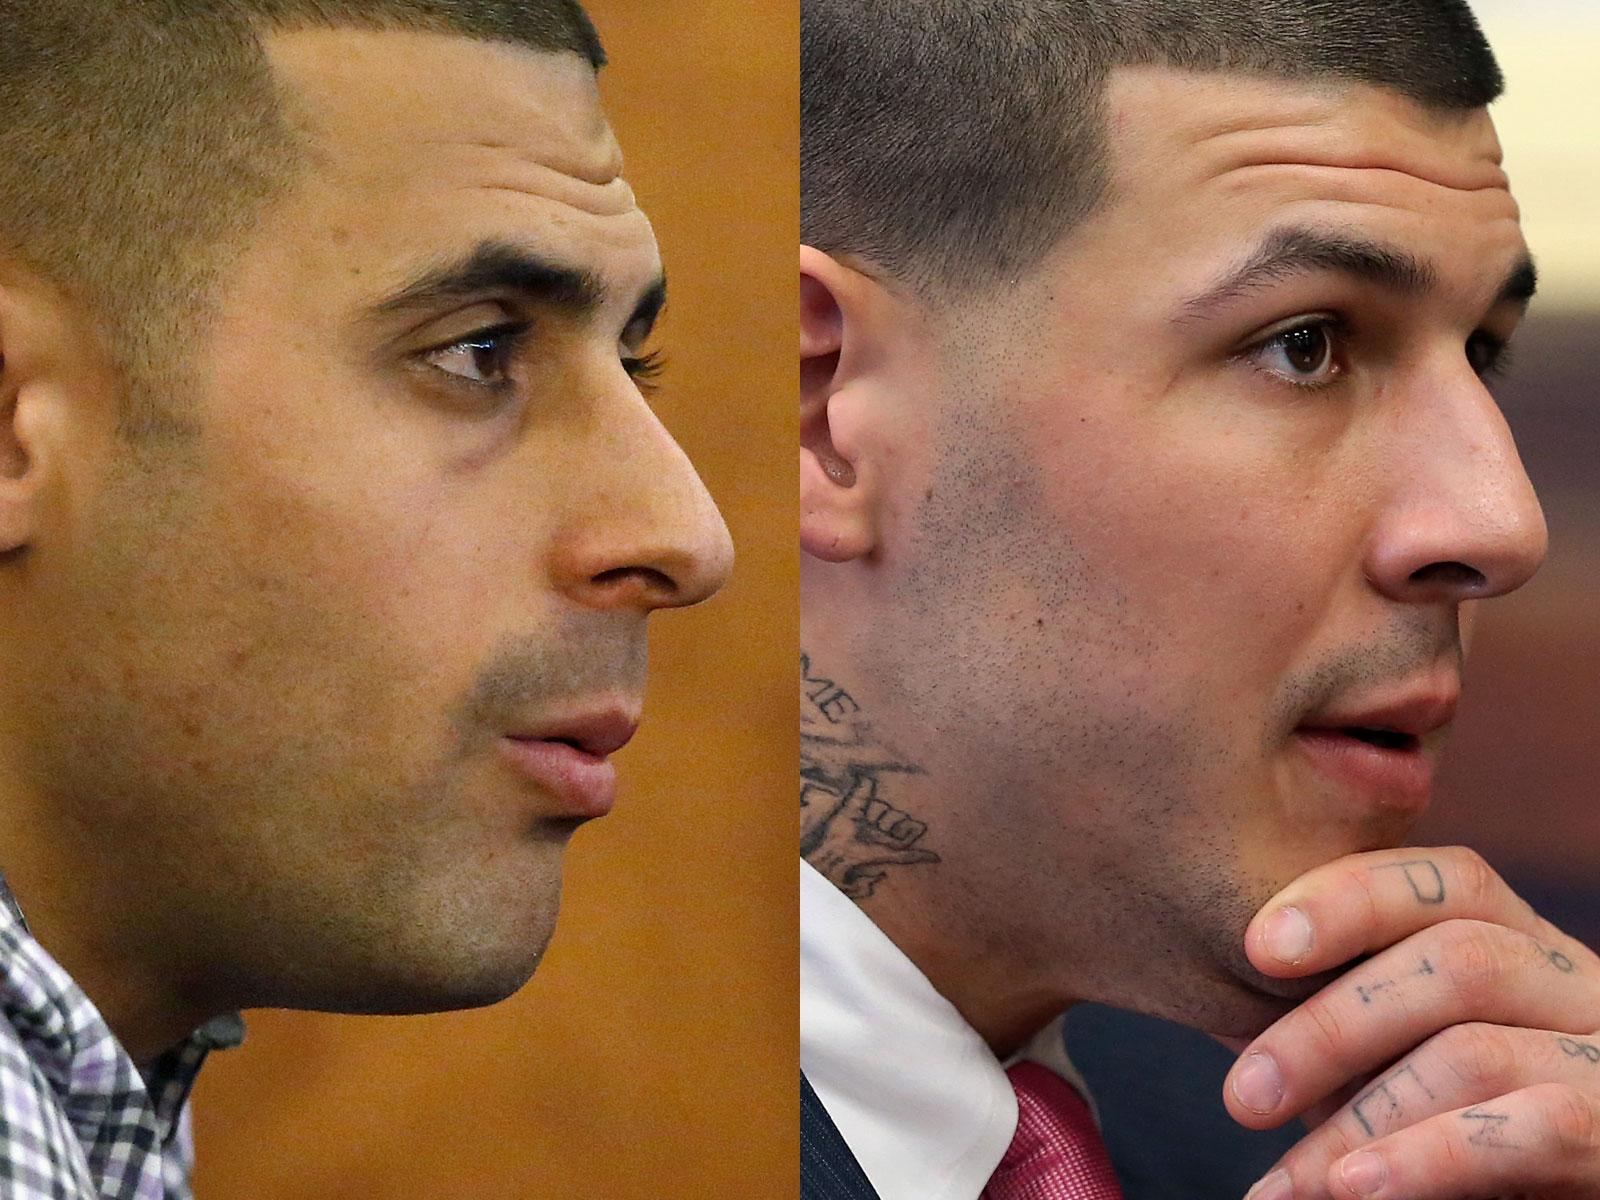 Aaron Hernandezs Brother Retraces Nfl Stars Path To Murder